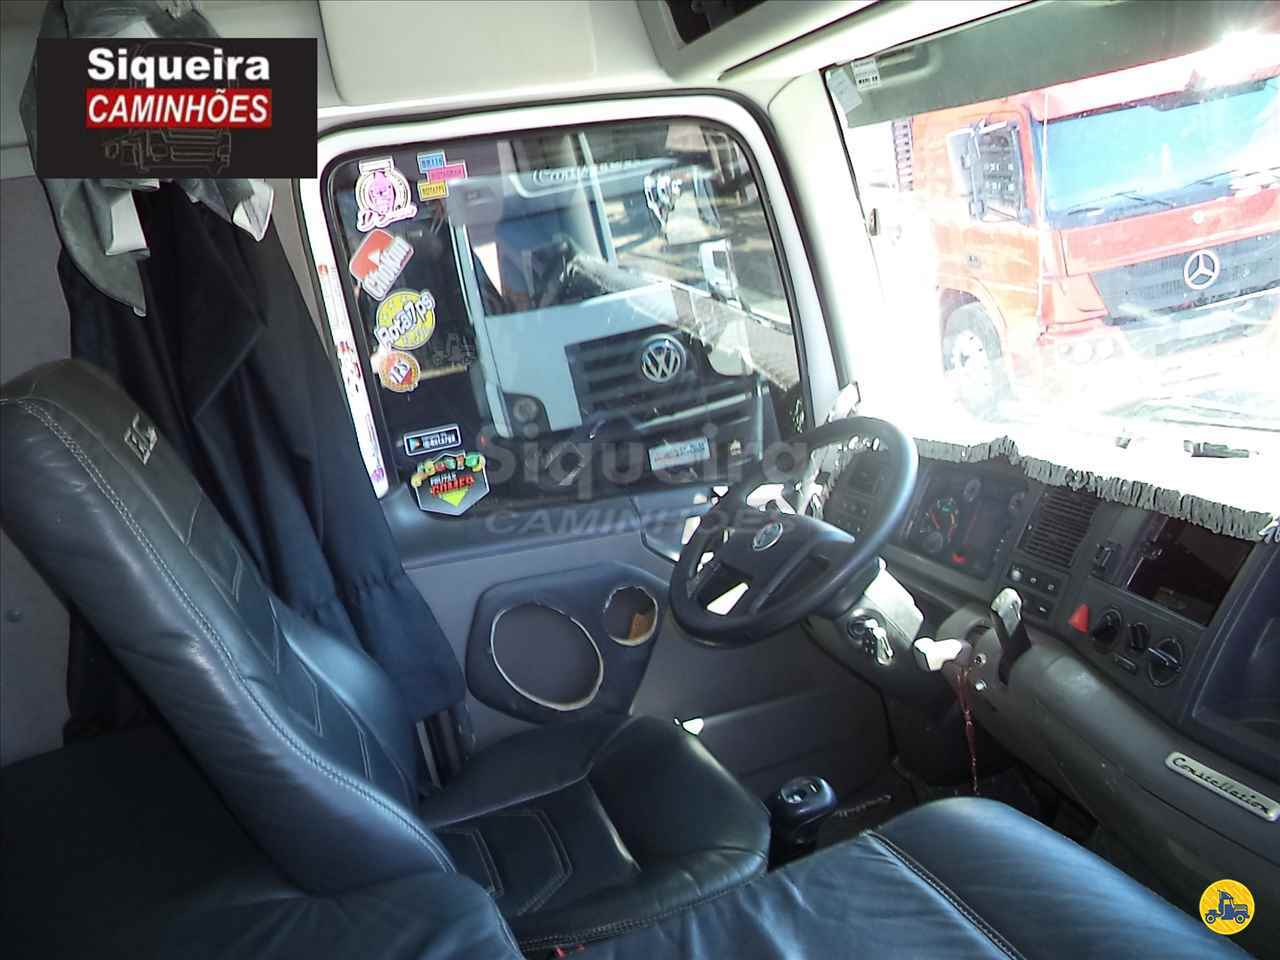 VOLKSWAGEN VW 25390 750000km 2014/2014 Siqueira Caminhões